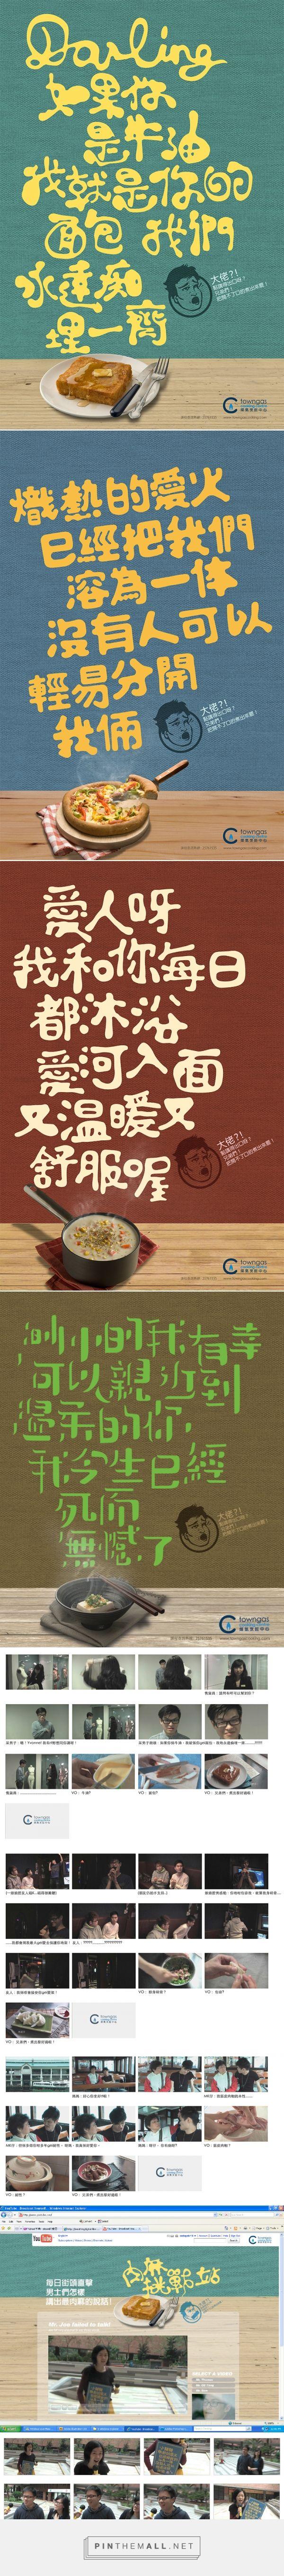 "Towngas Cooking Center - ""Hey men! Lets start cooking!"" on Behance   https://www.behance.net/gallery/26710269/Towngas-Cooking-Center-Hey-men-Lets-start-cooking - created via https://pinthemall.net"